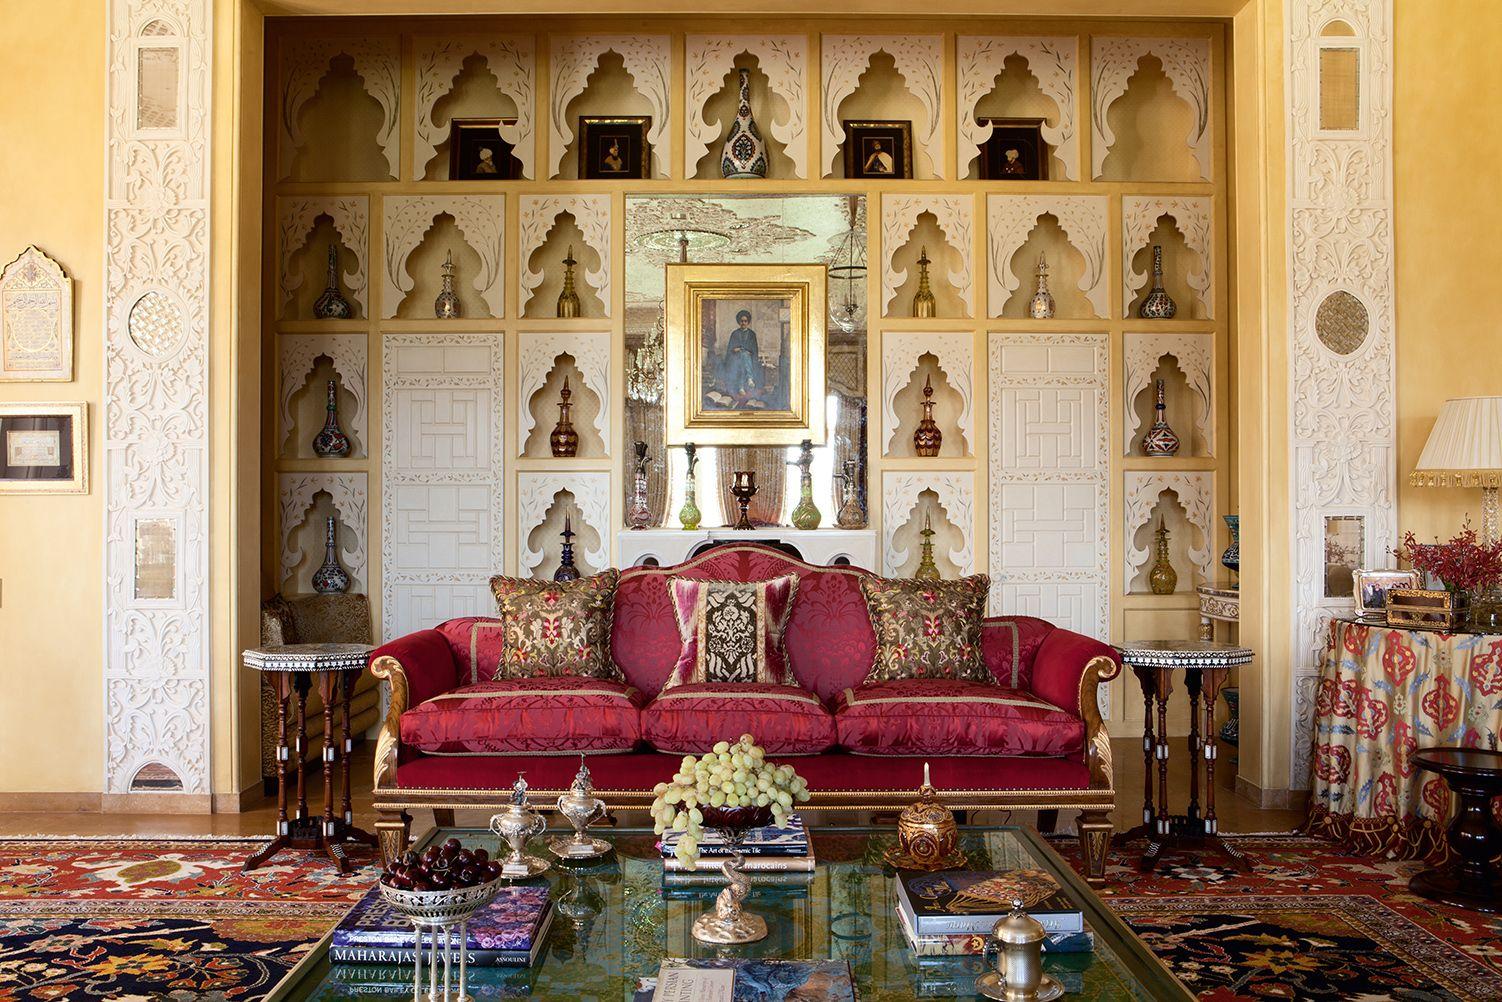 Interior Design Gallery of Interior Design Projects